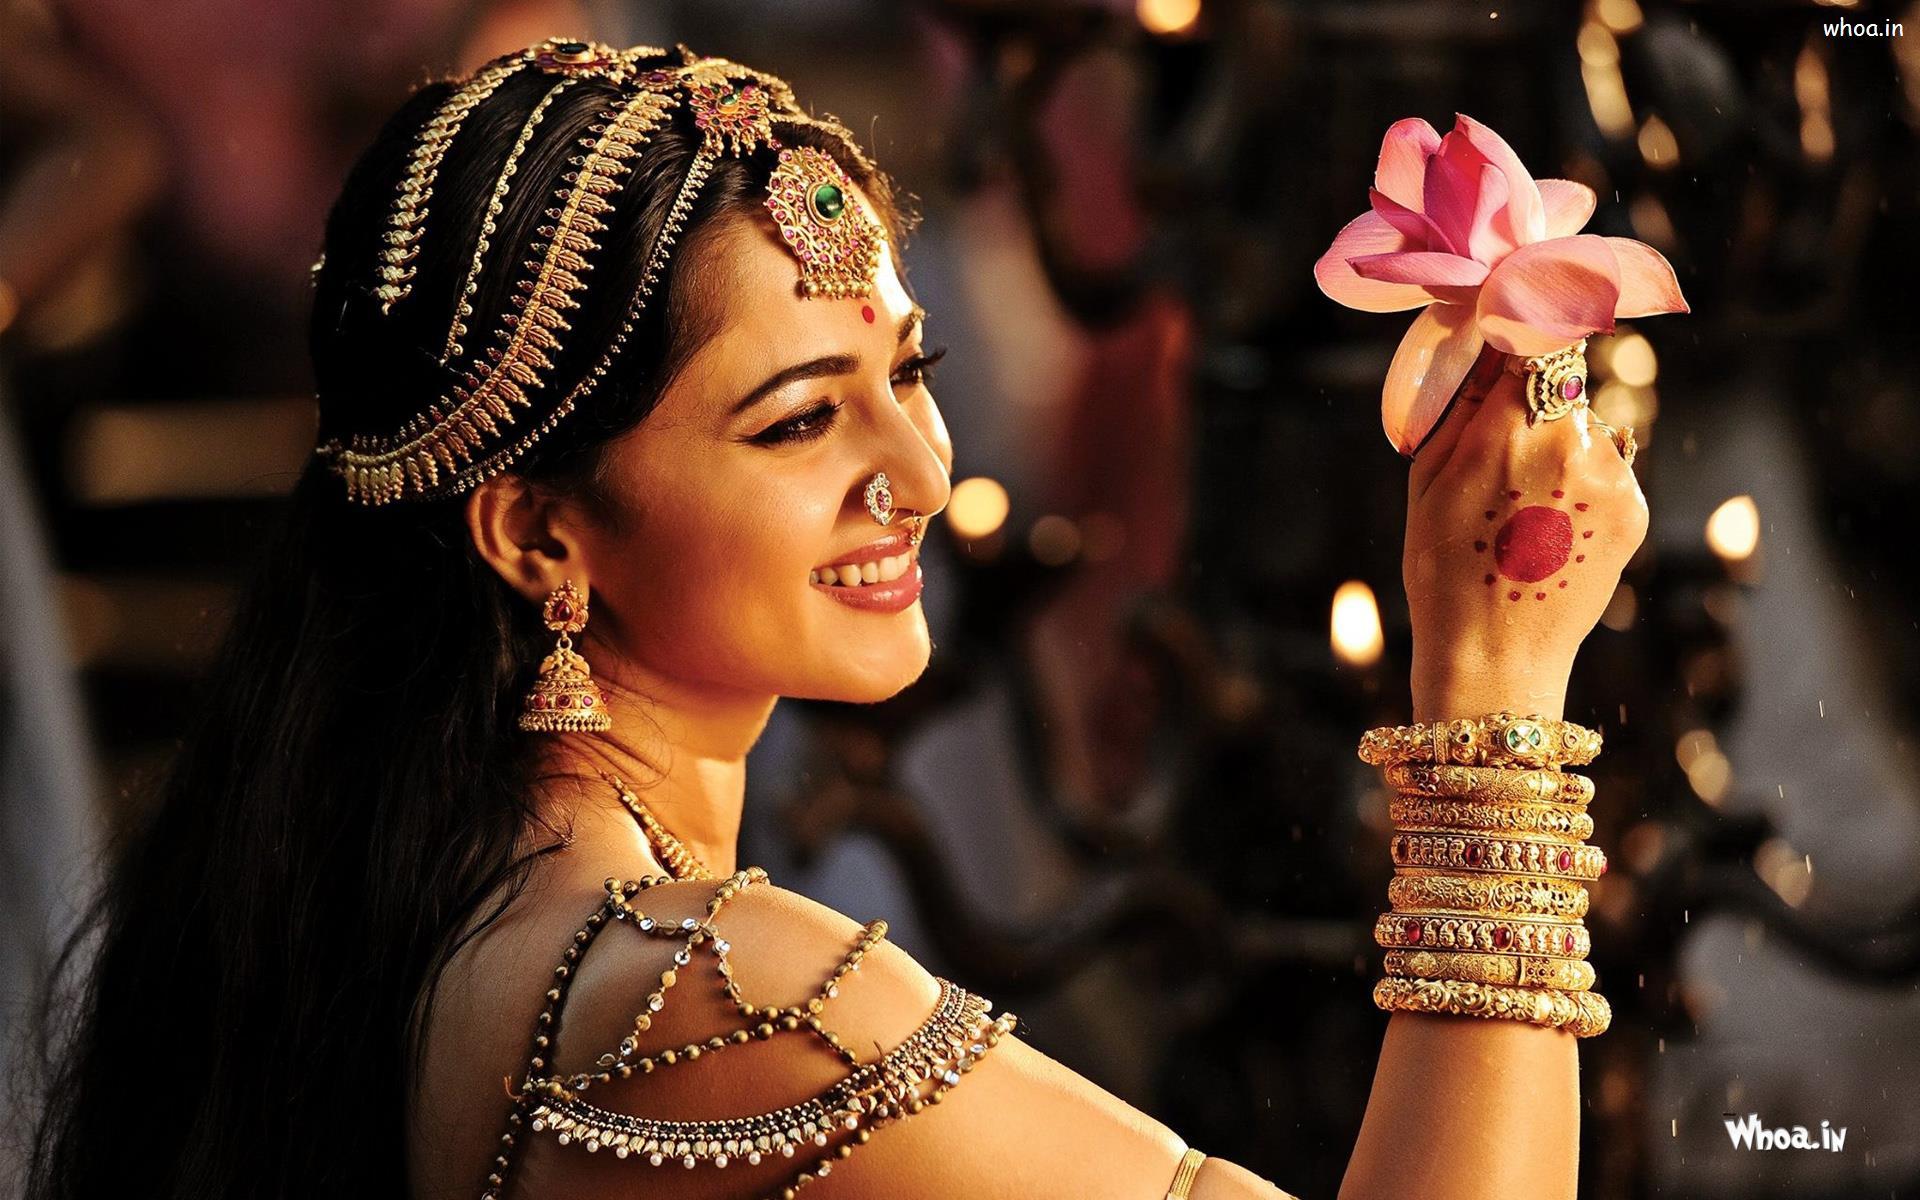 rudhramadevi anushka shetty movies hd wallpaper